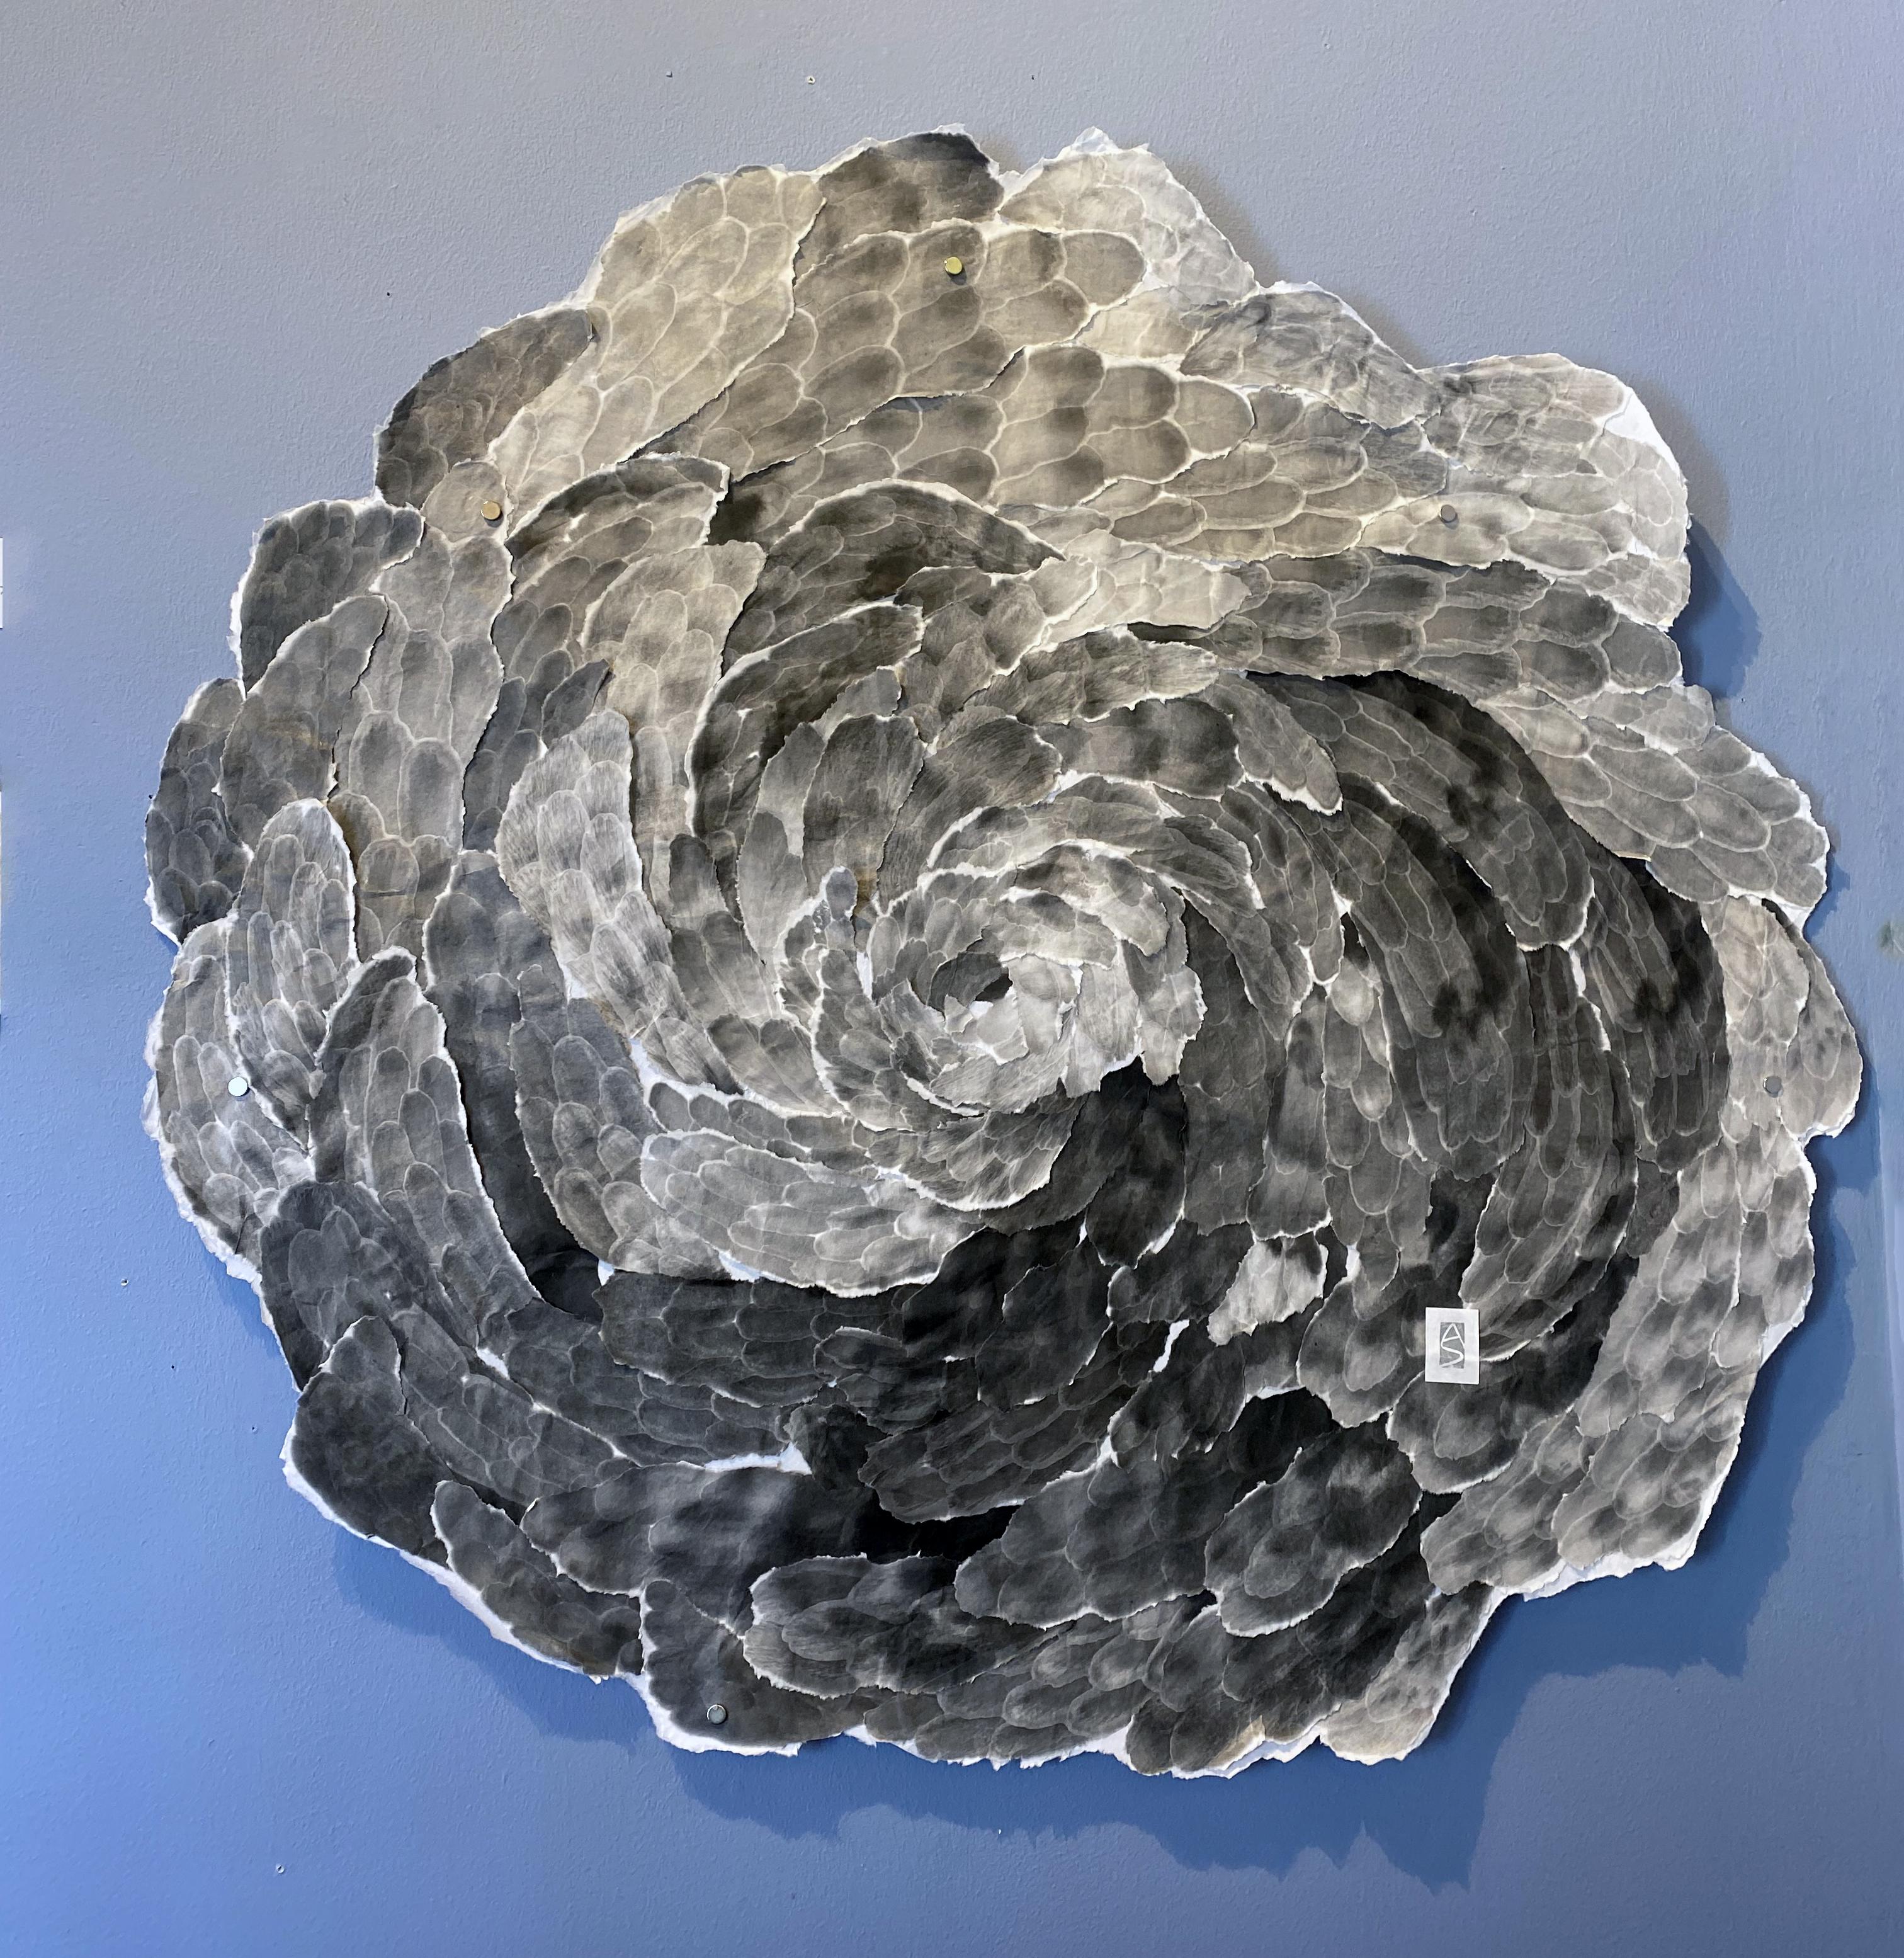 MANDALA SWIRL, sumi ink on rice paper collage, 42 inch diameter